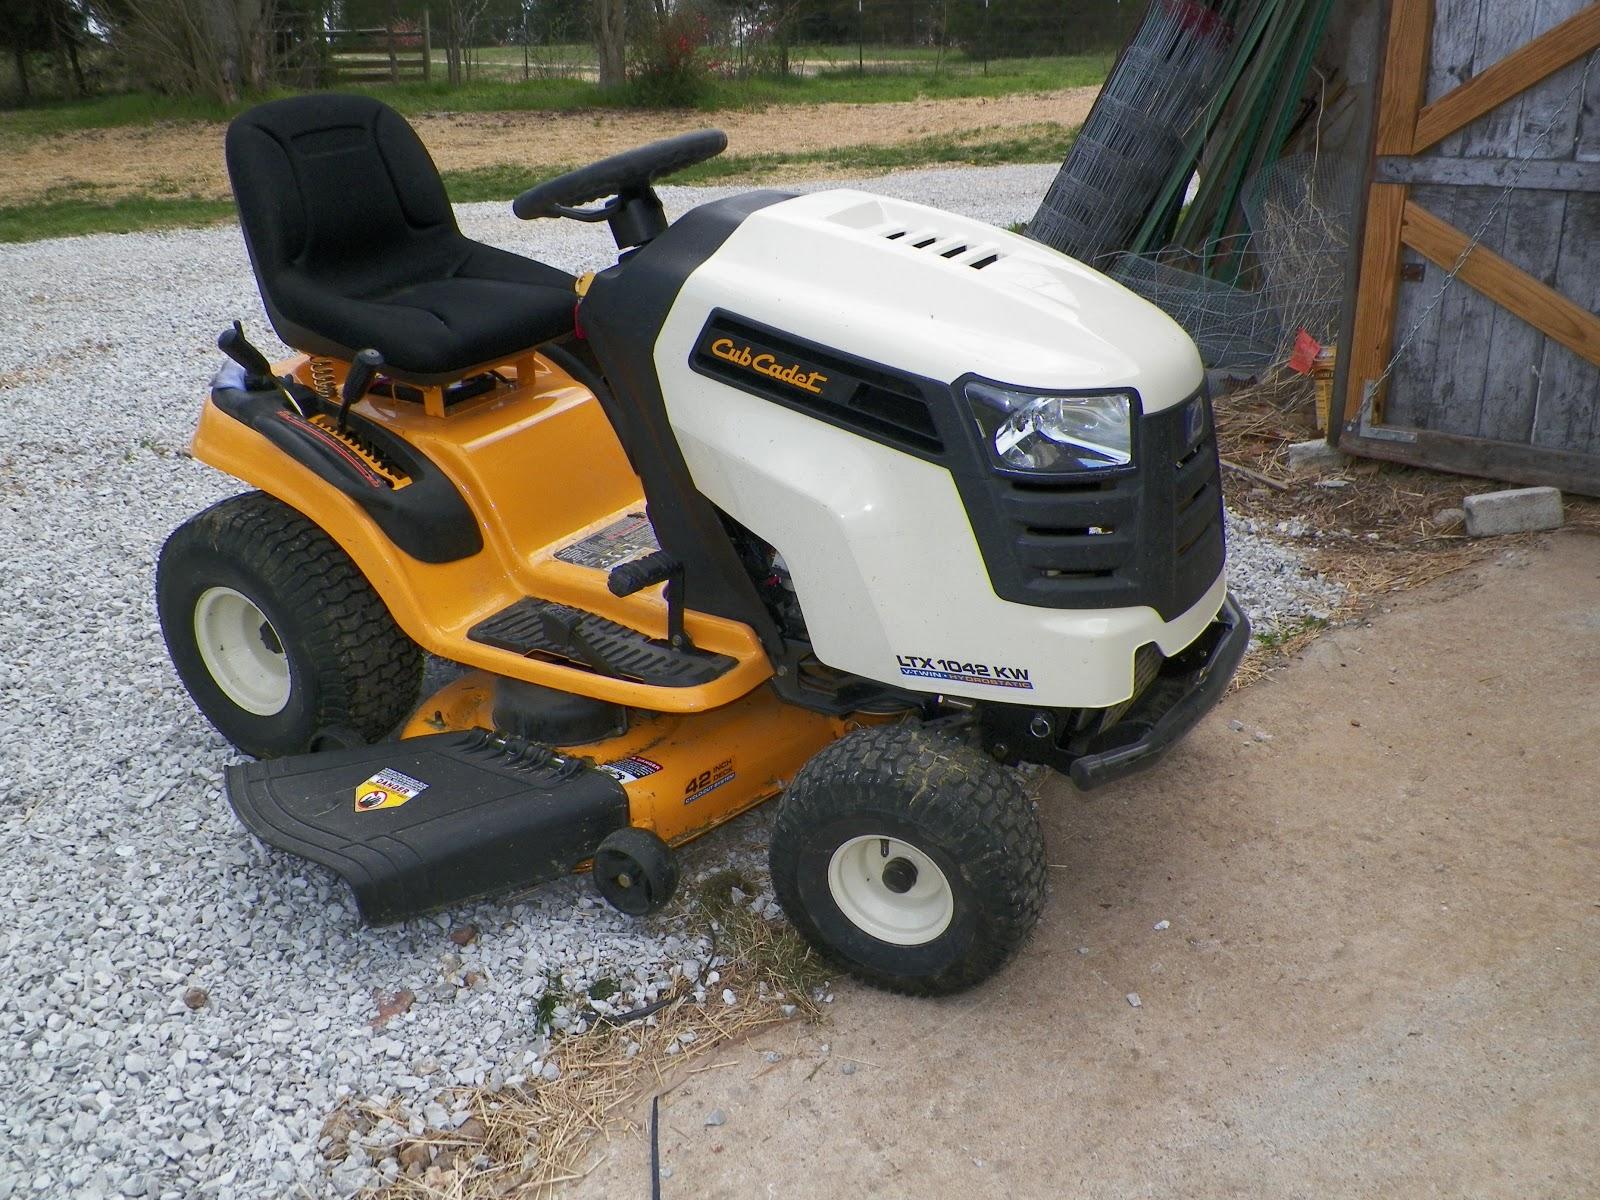 Cub Cadet Ltx 1042 Kw Lawn Tractor : Simple life a new mower